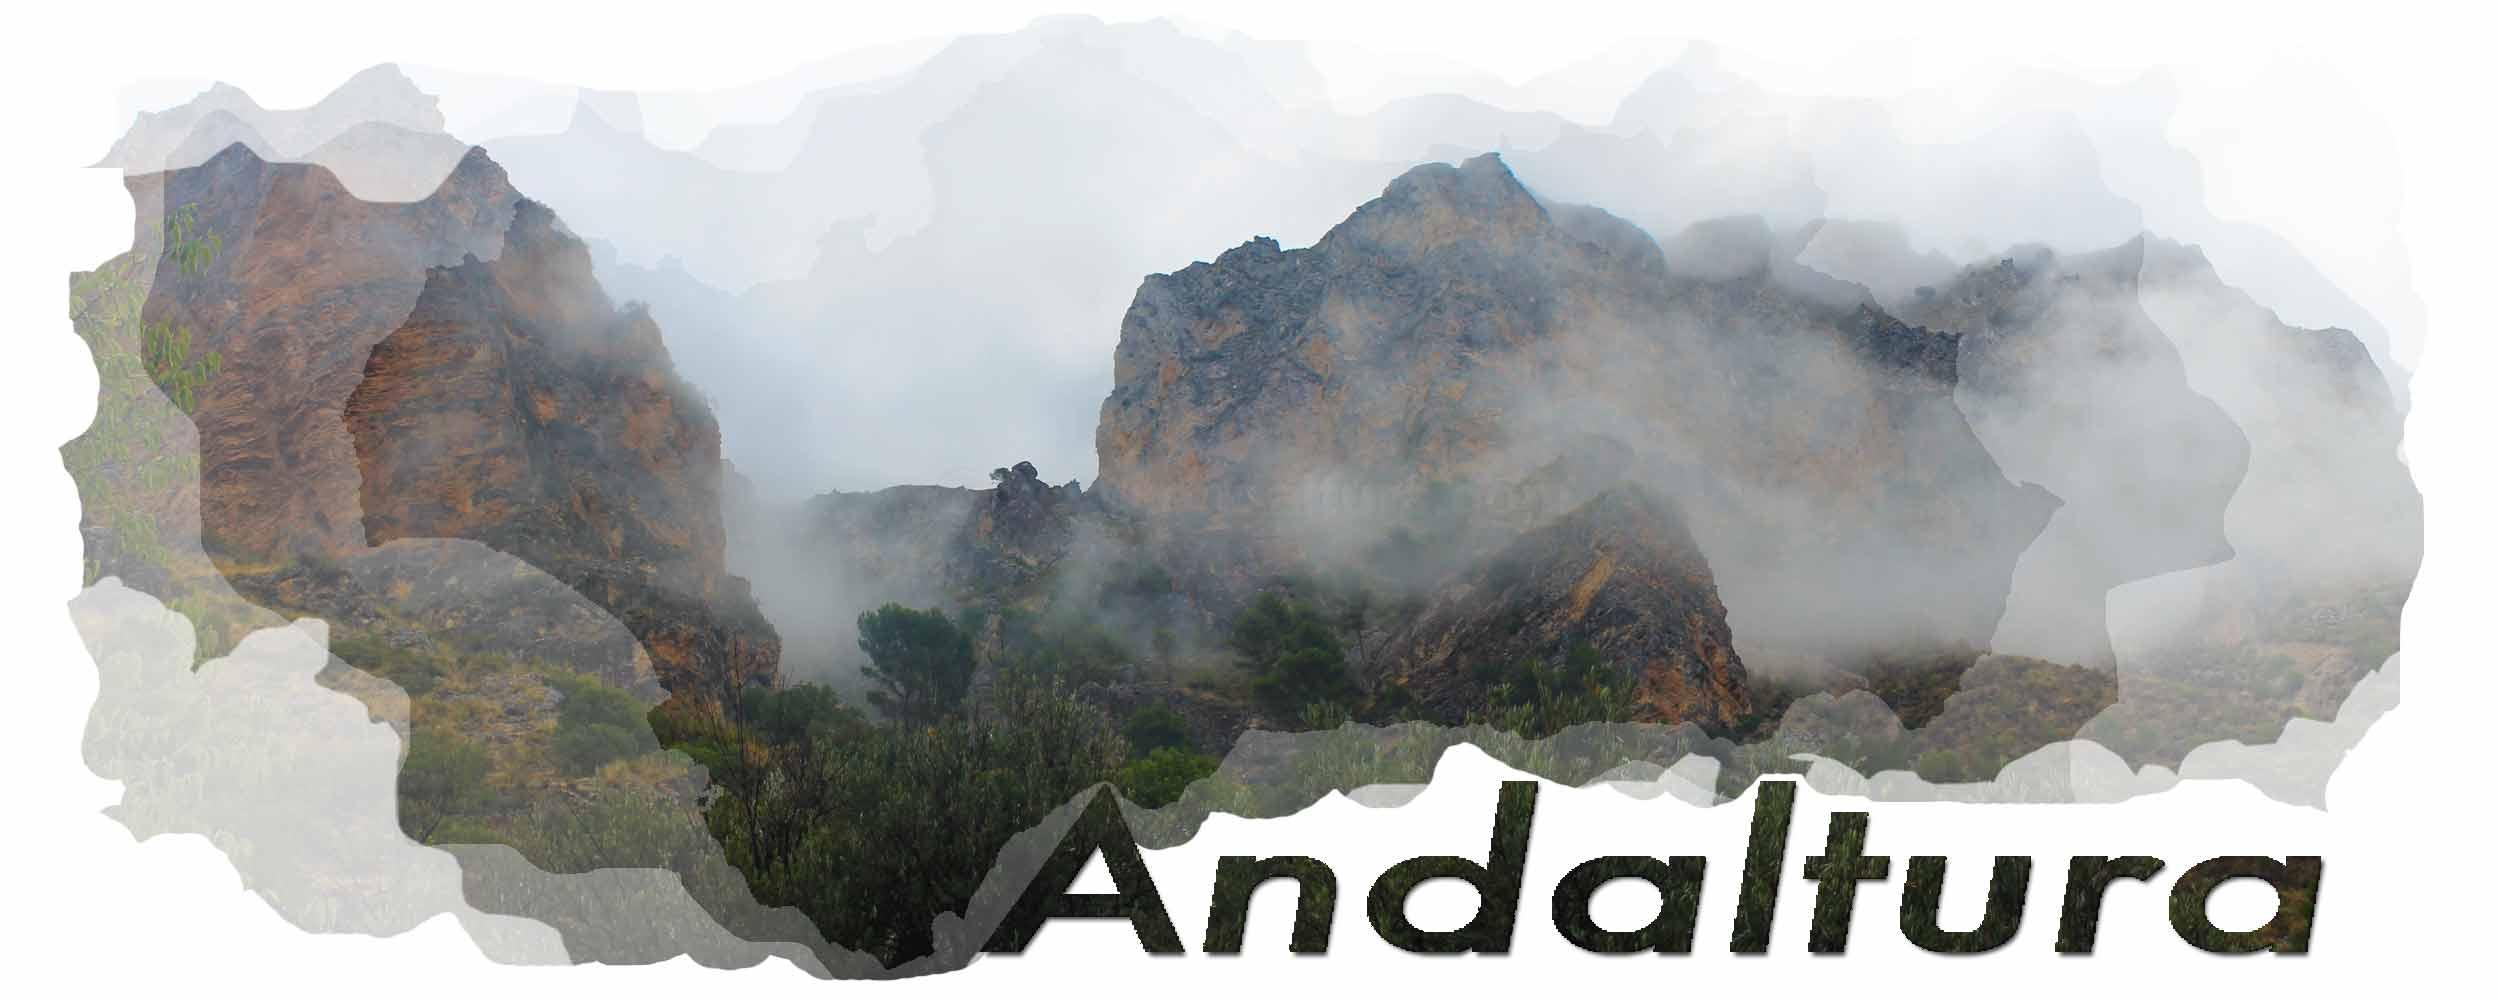 Cabecera plagio ruta GR142 de Órgiva a Fondales -2-. Sierra de Moclín